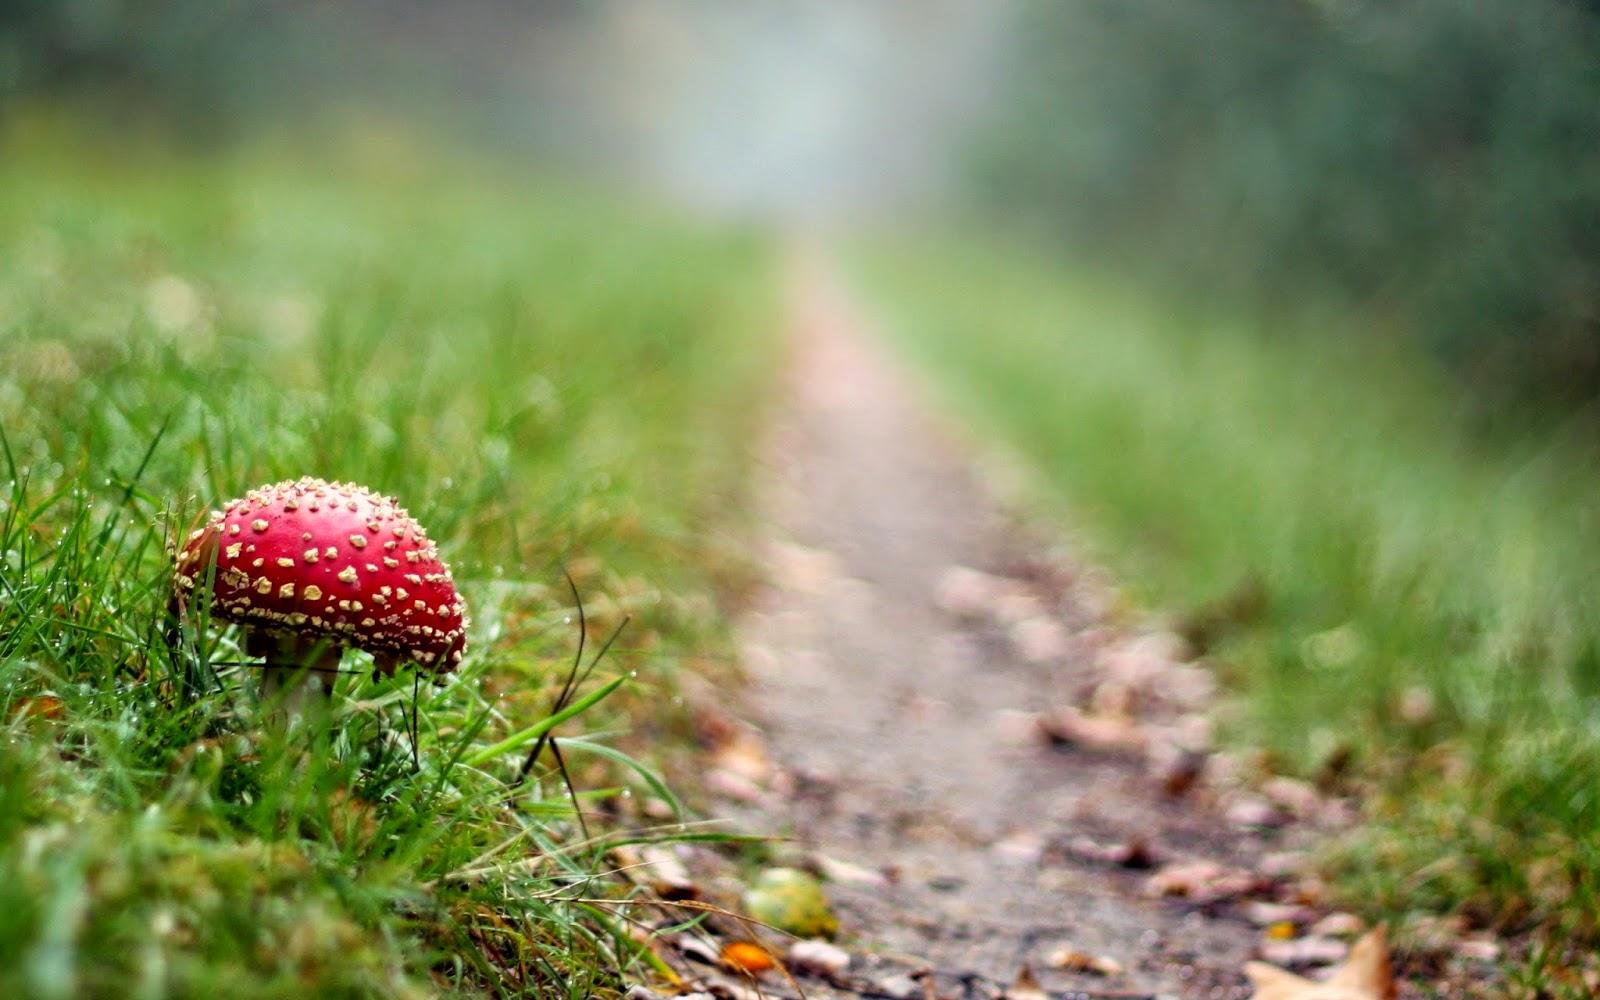 mushroom photography wallpaper 50990